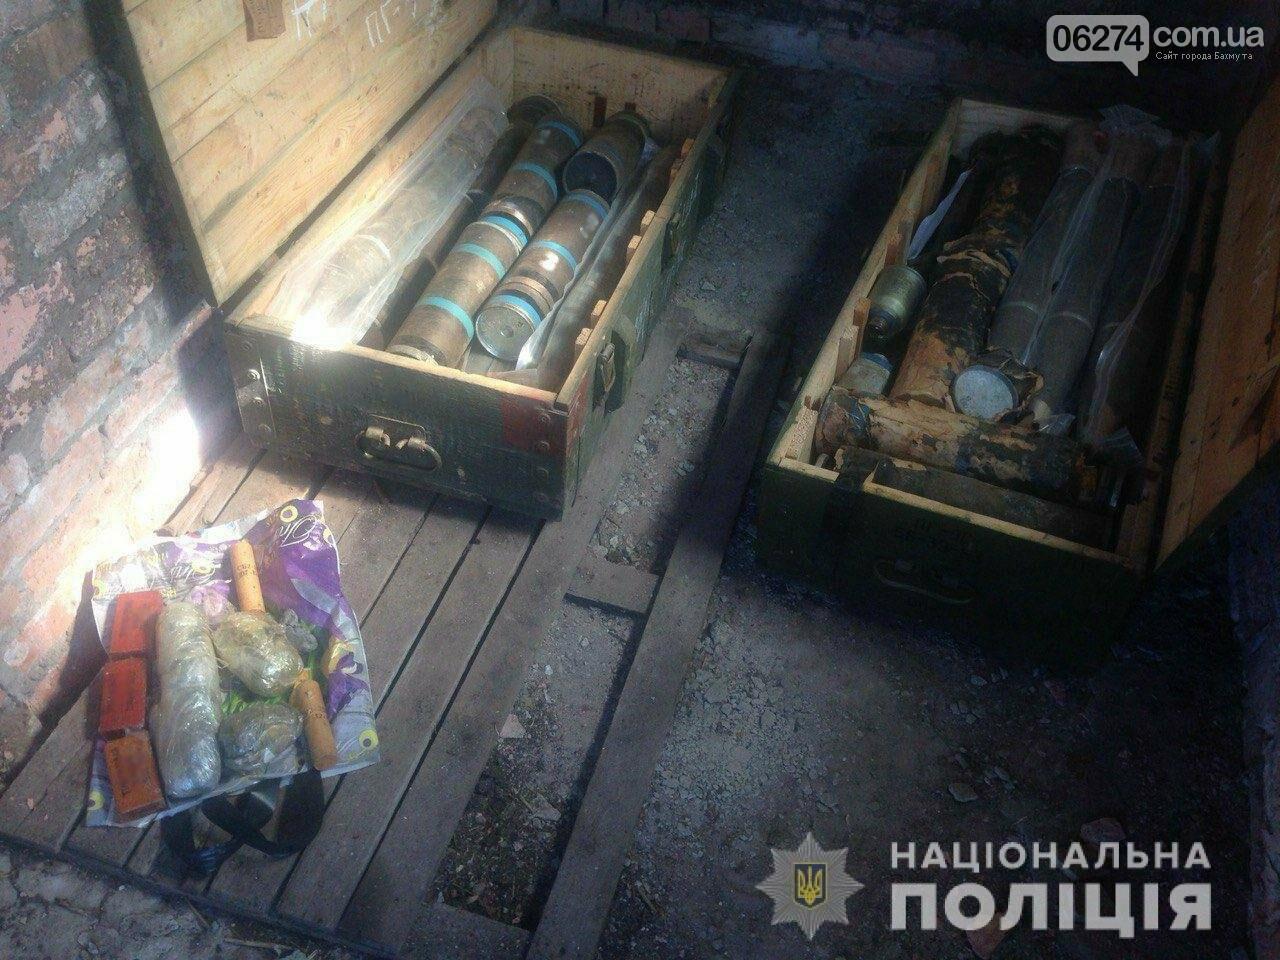 Во время отработки Бахмутского района полицейские изъяли боеприпасы, фото-1